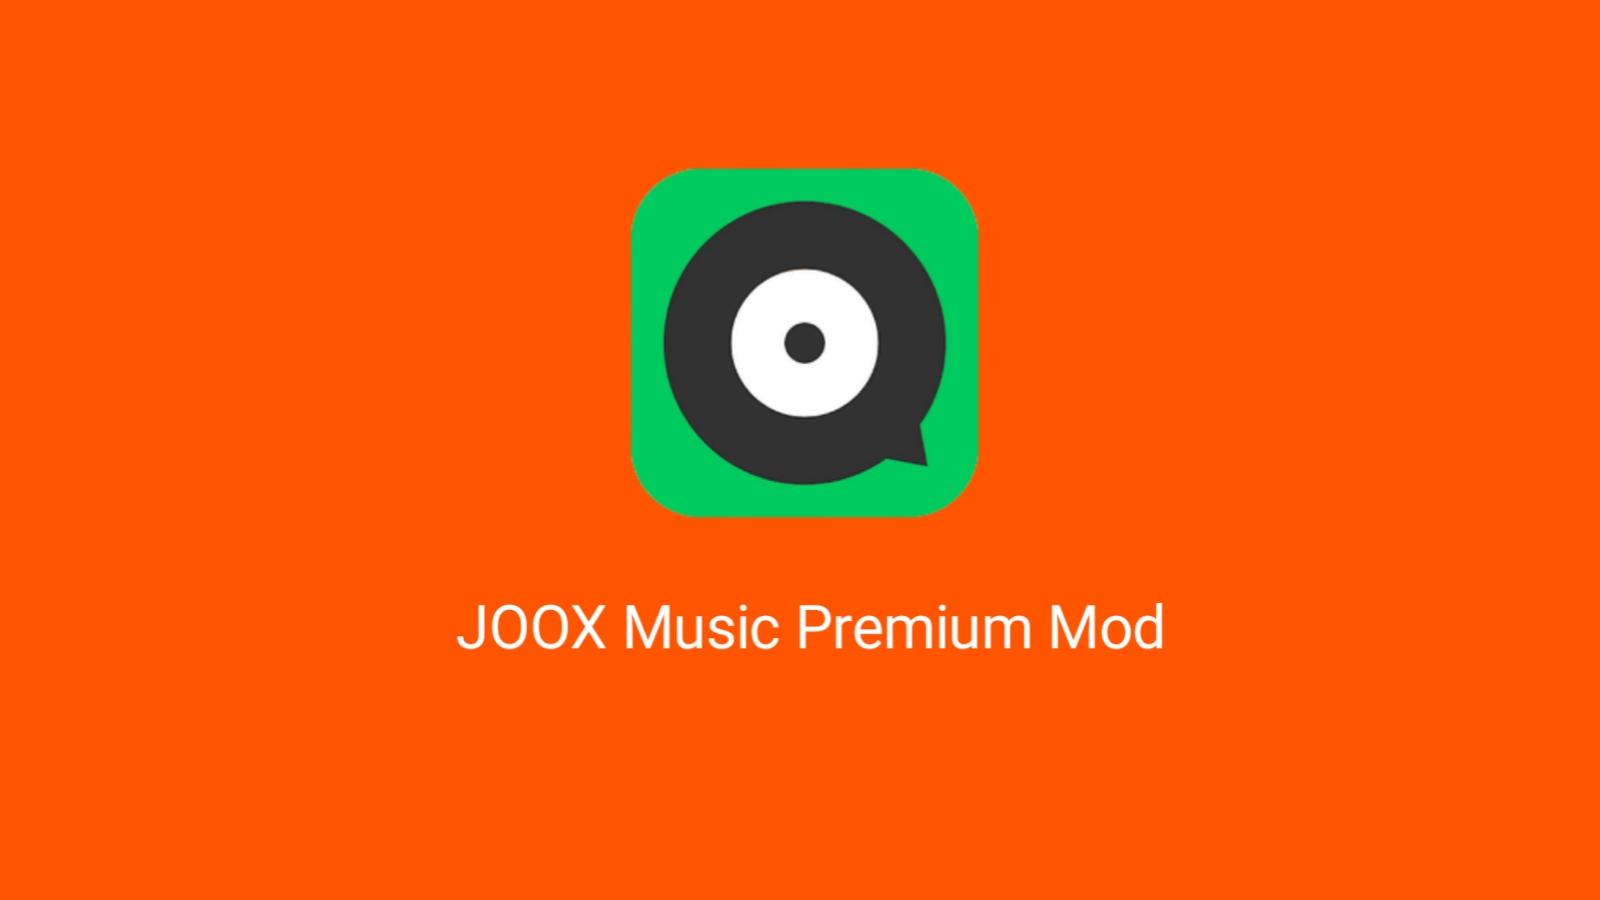 JOOX Music Premium MOD v5.7.3 APK